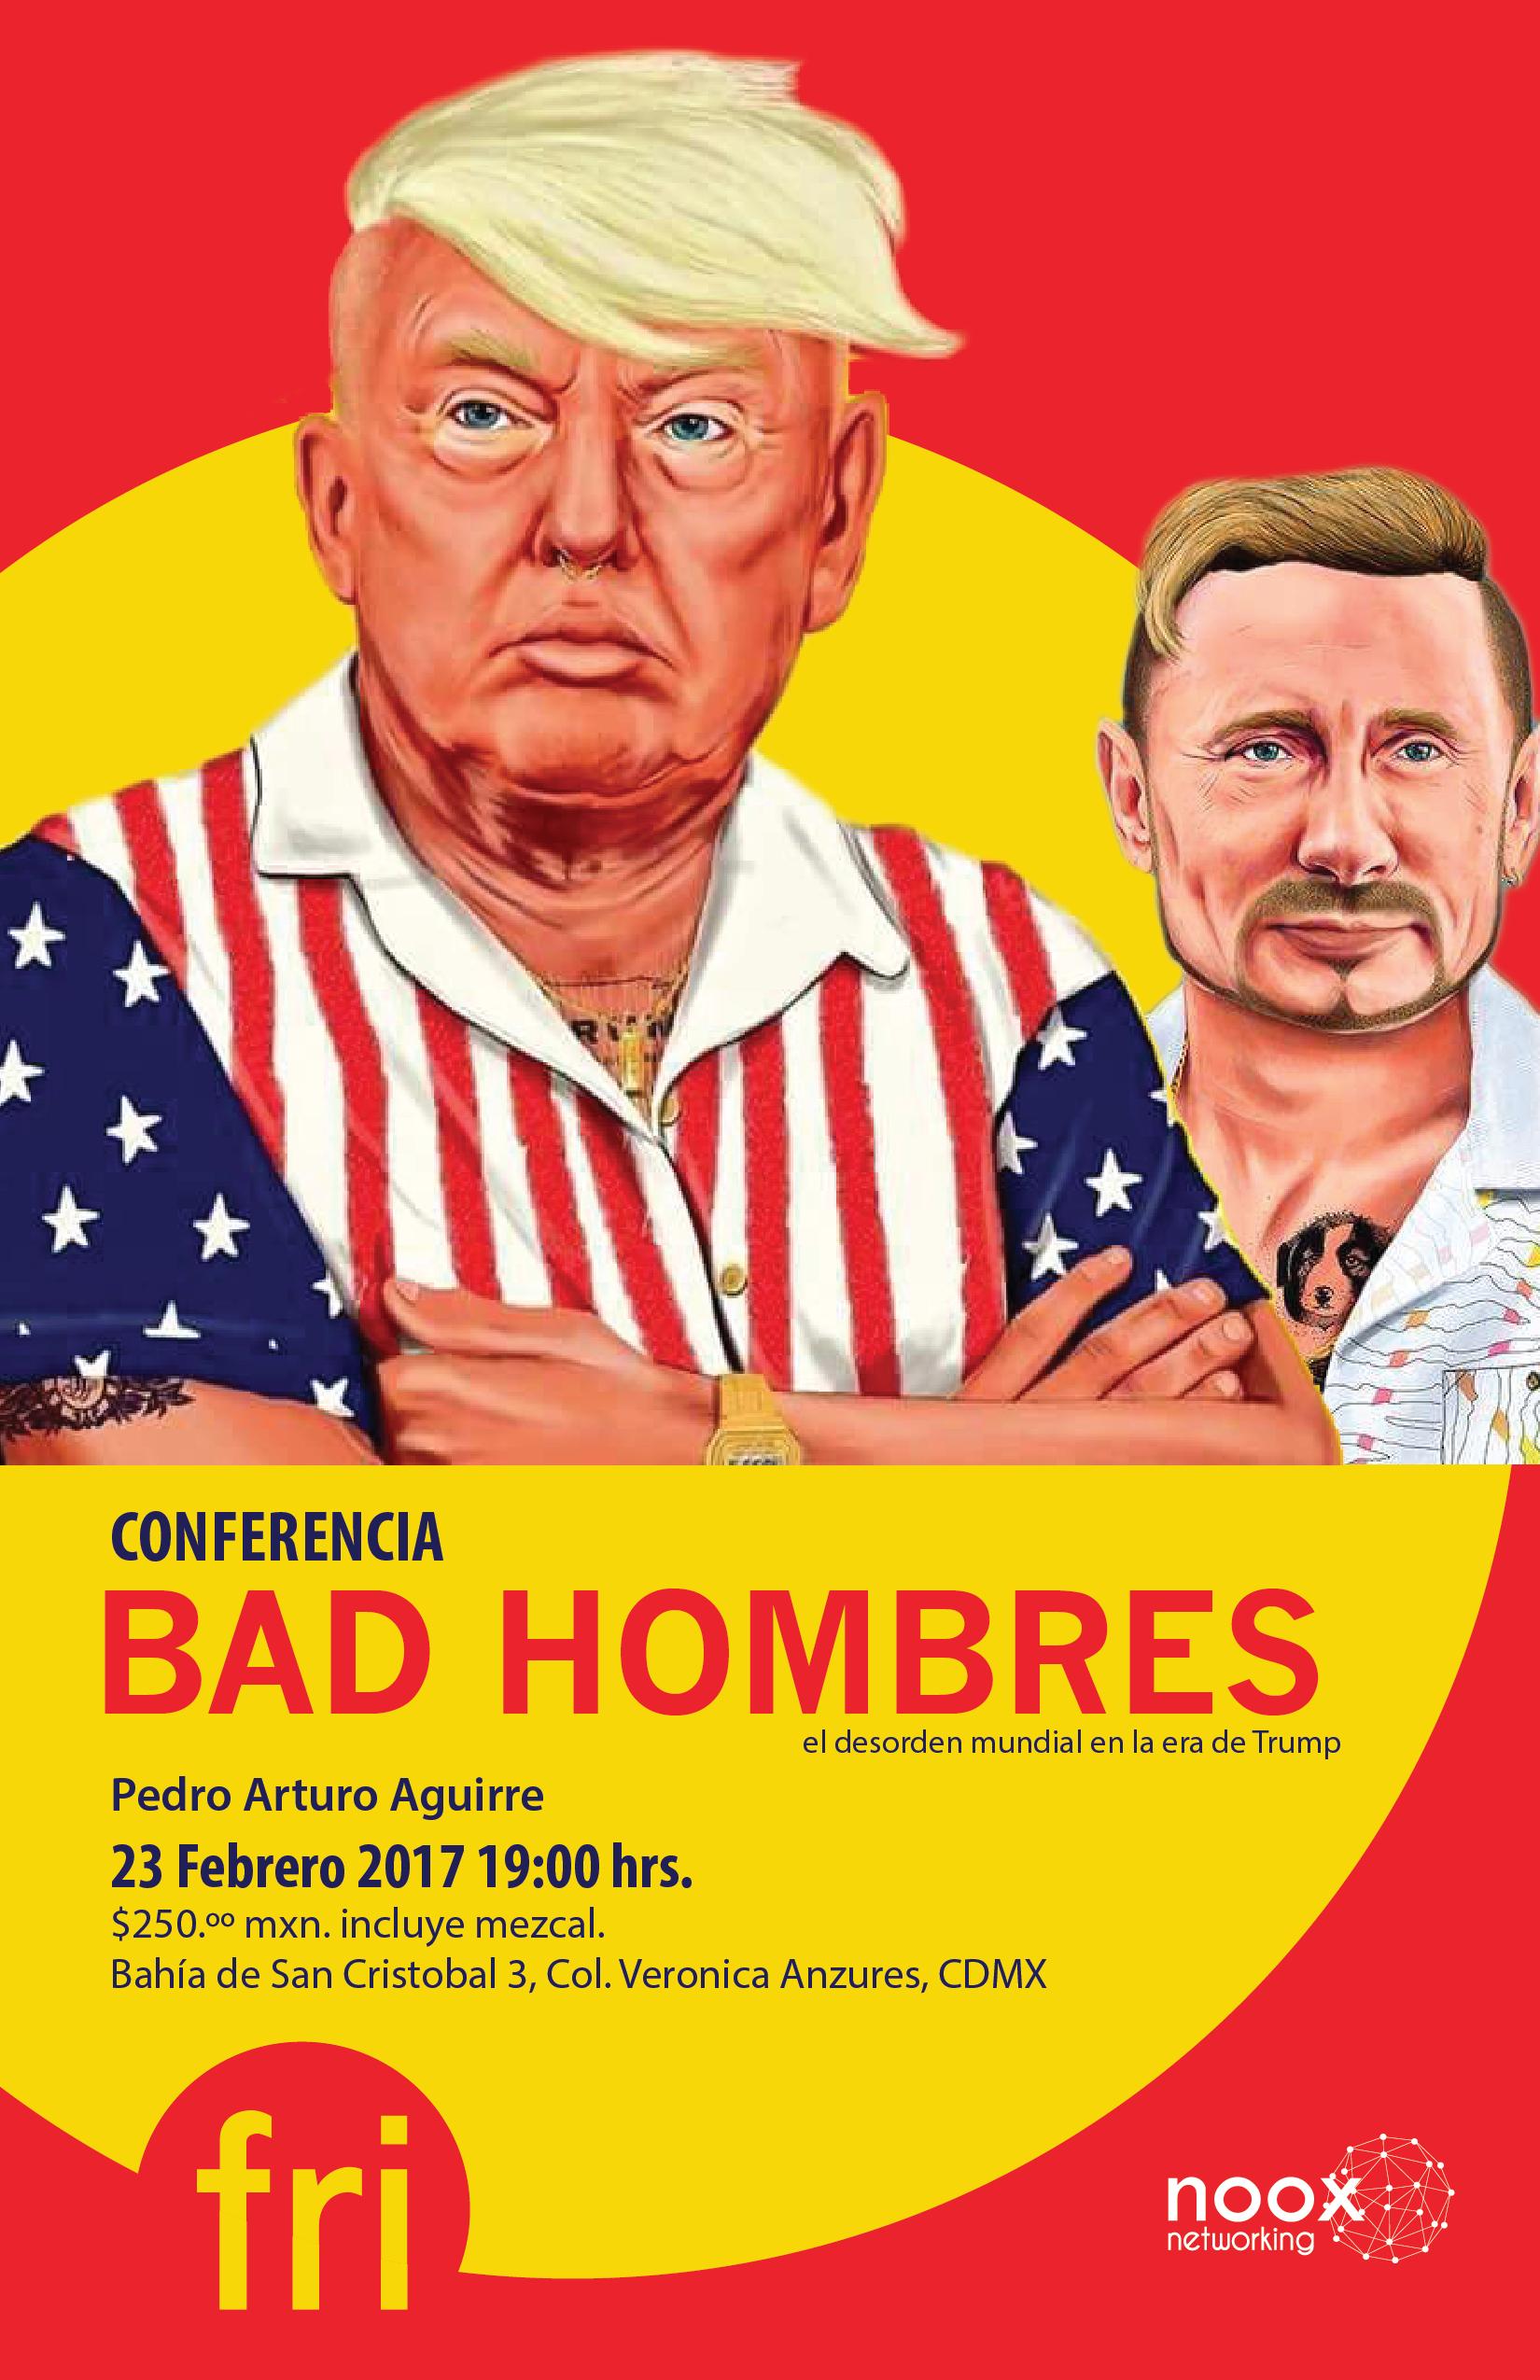 bad hombres-01